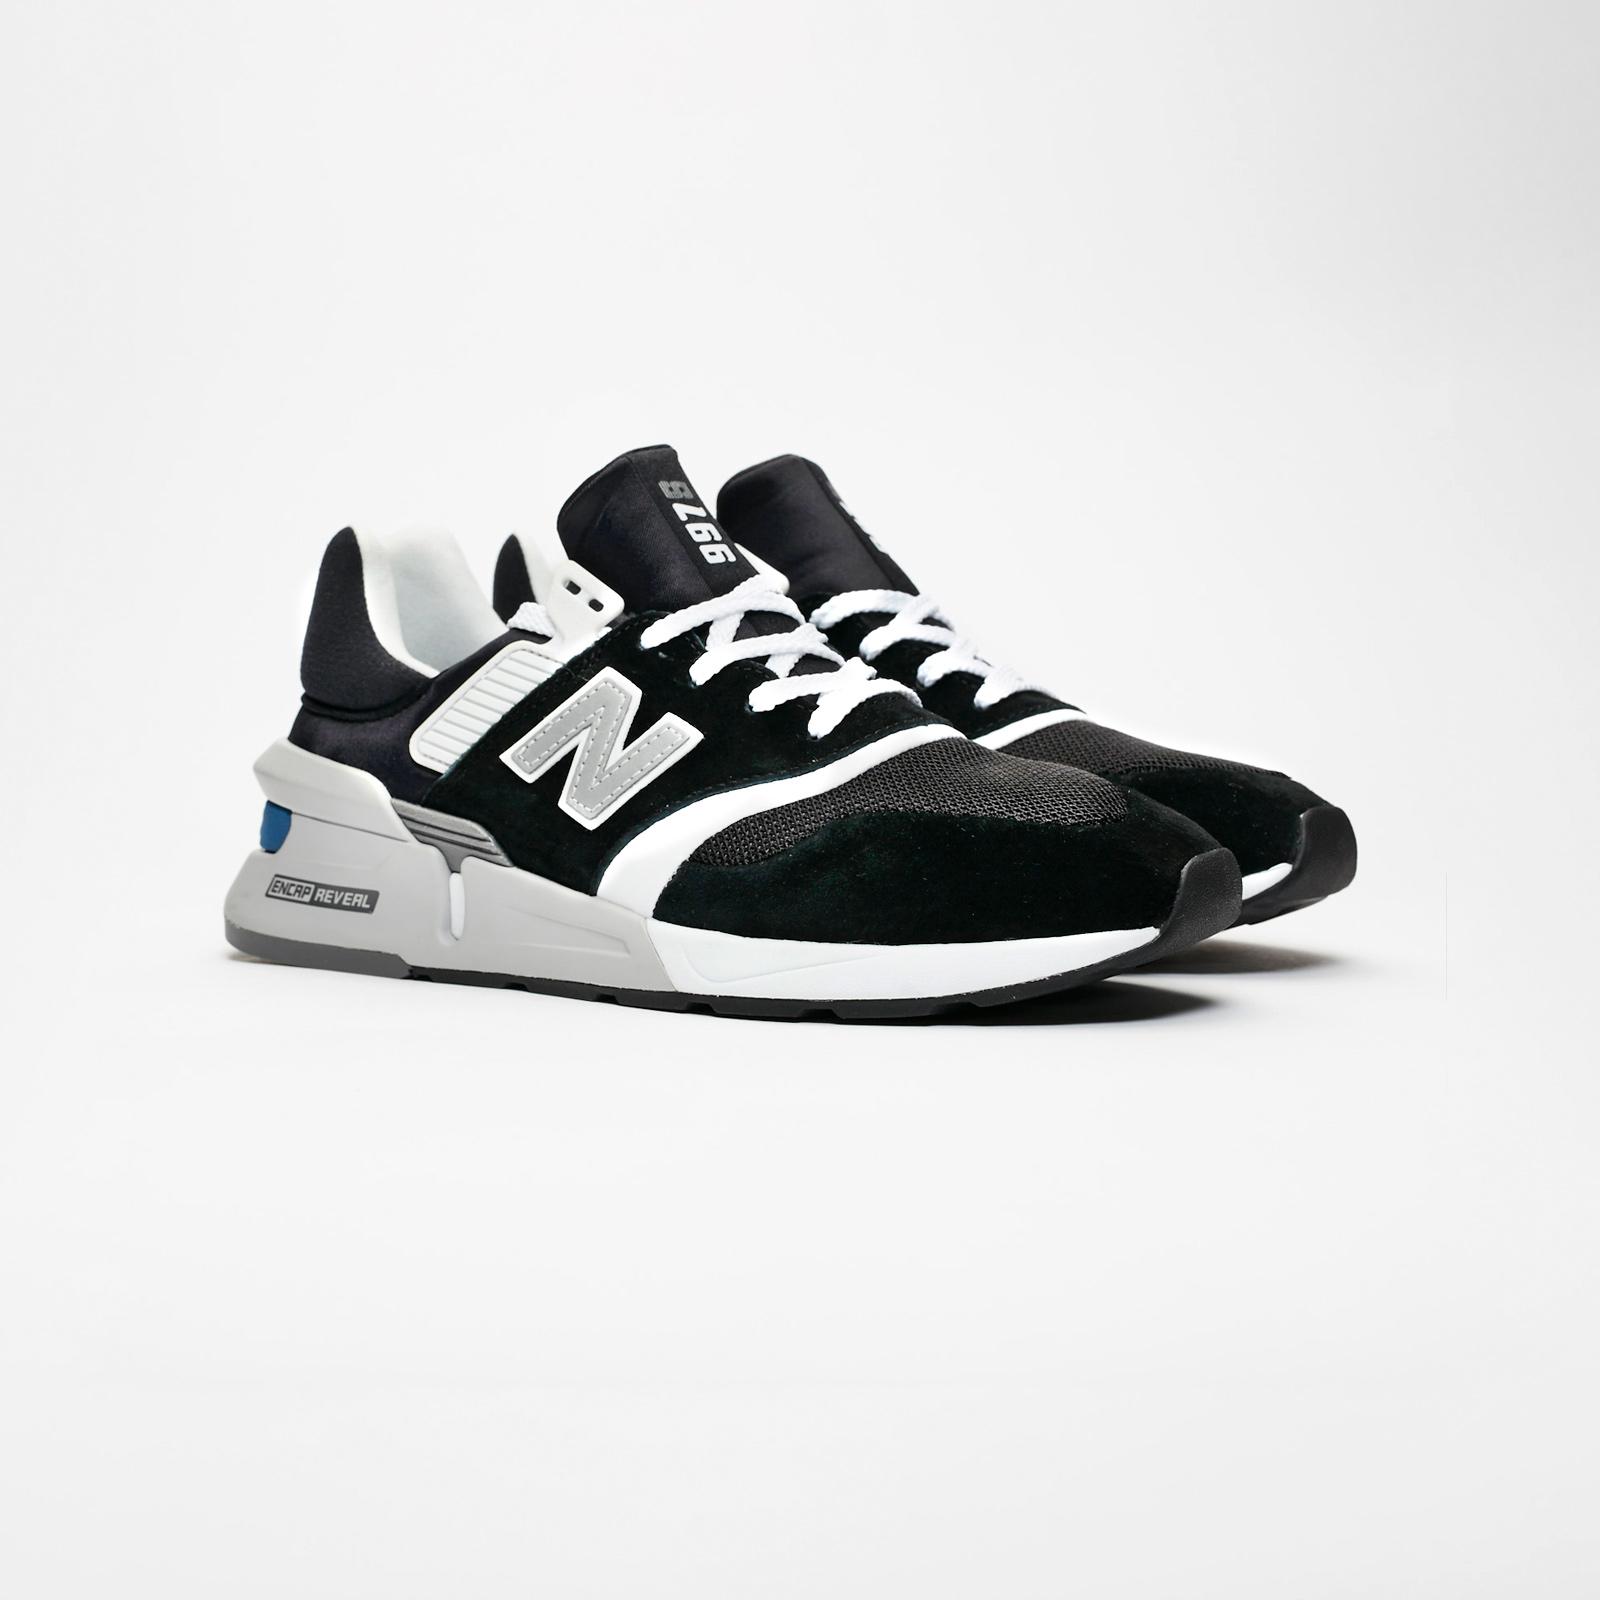 6687b5fcb4c0 New Balance MS997 - Ms997hga - Sneakersnstuff | sneakers ...